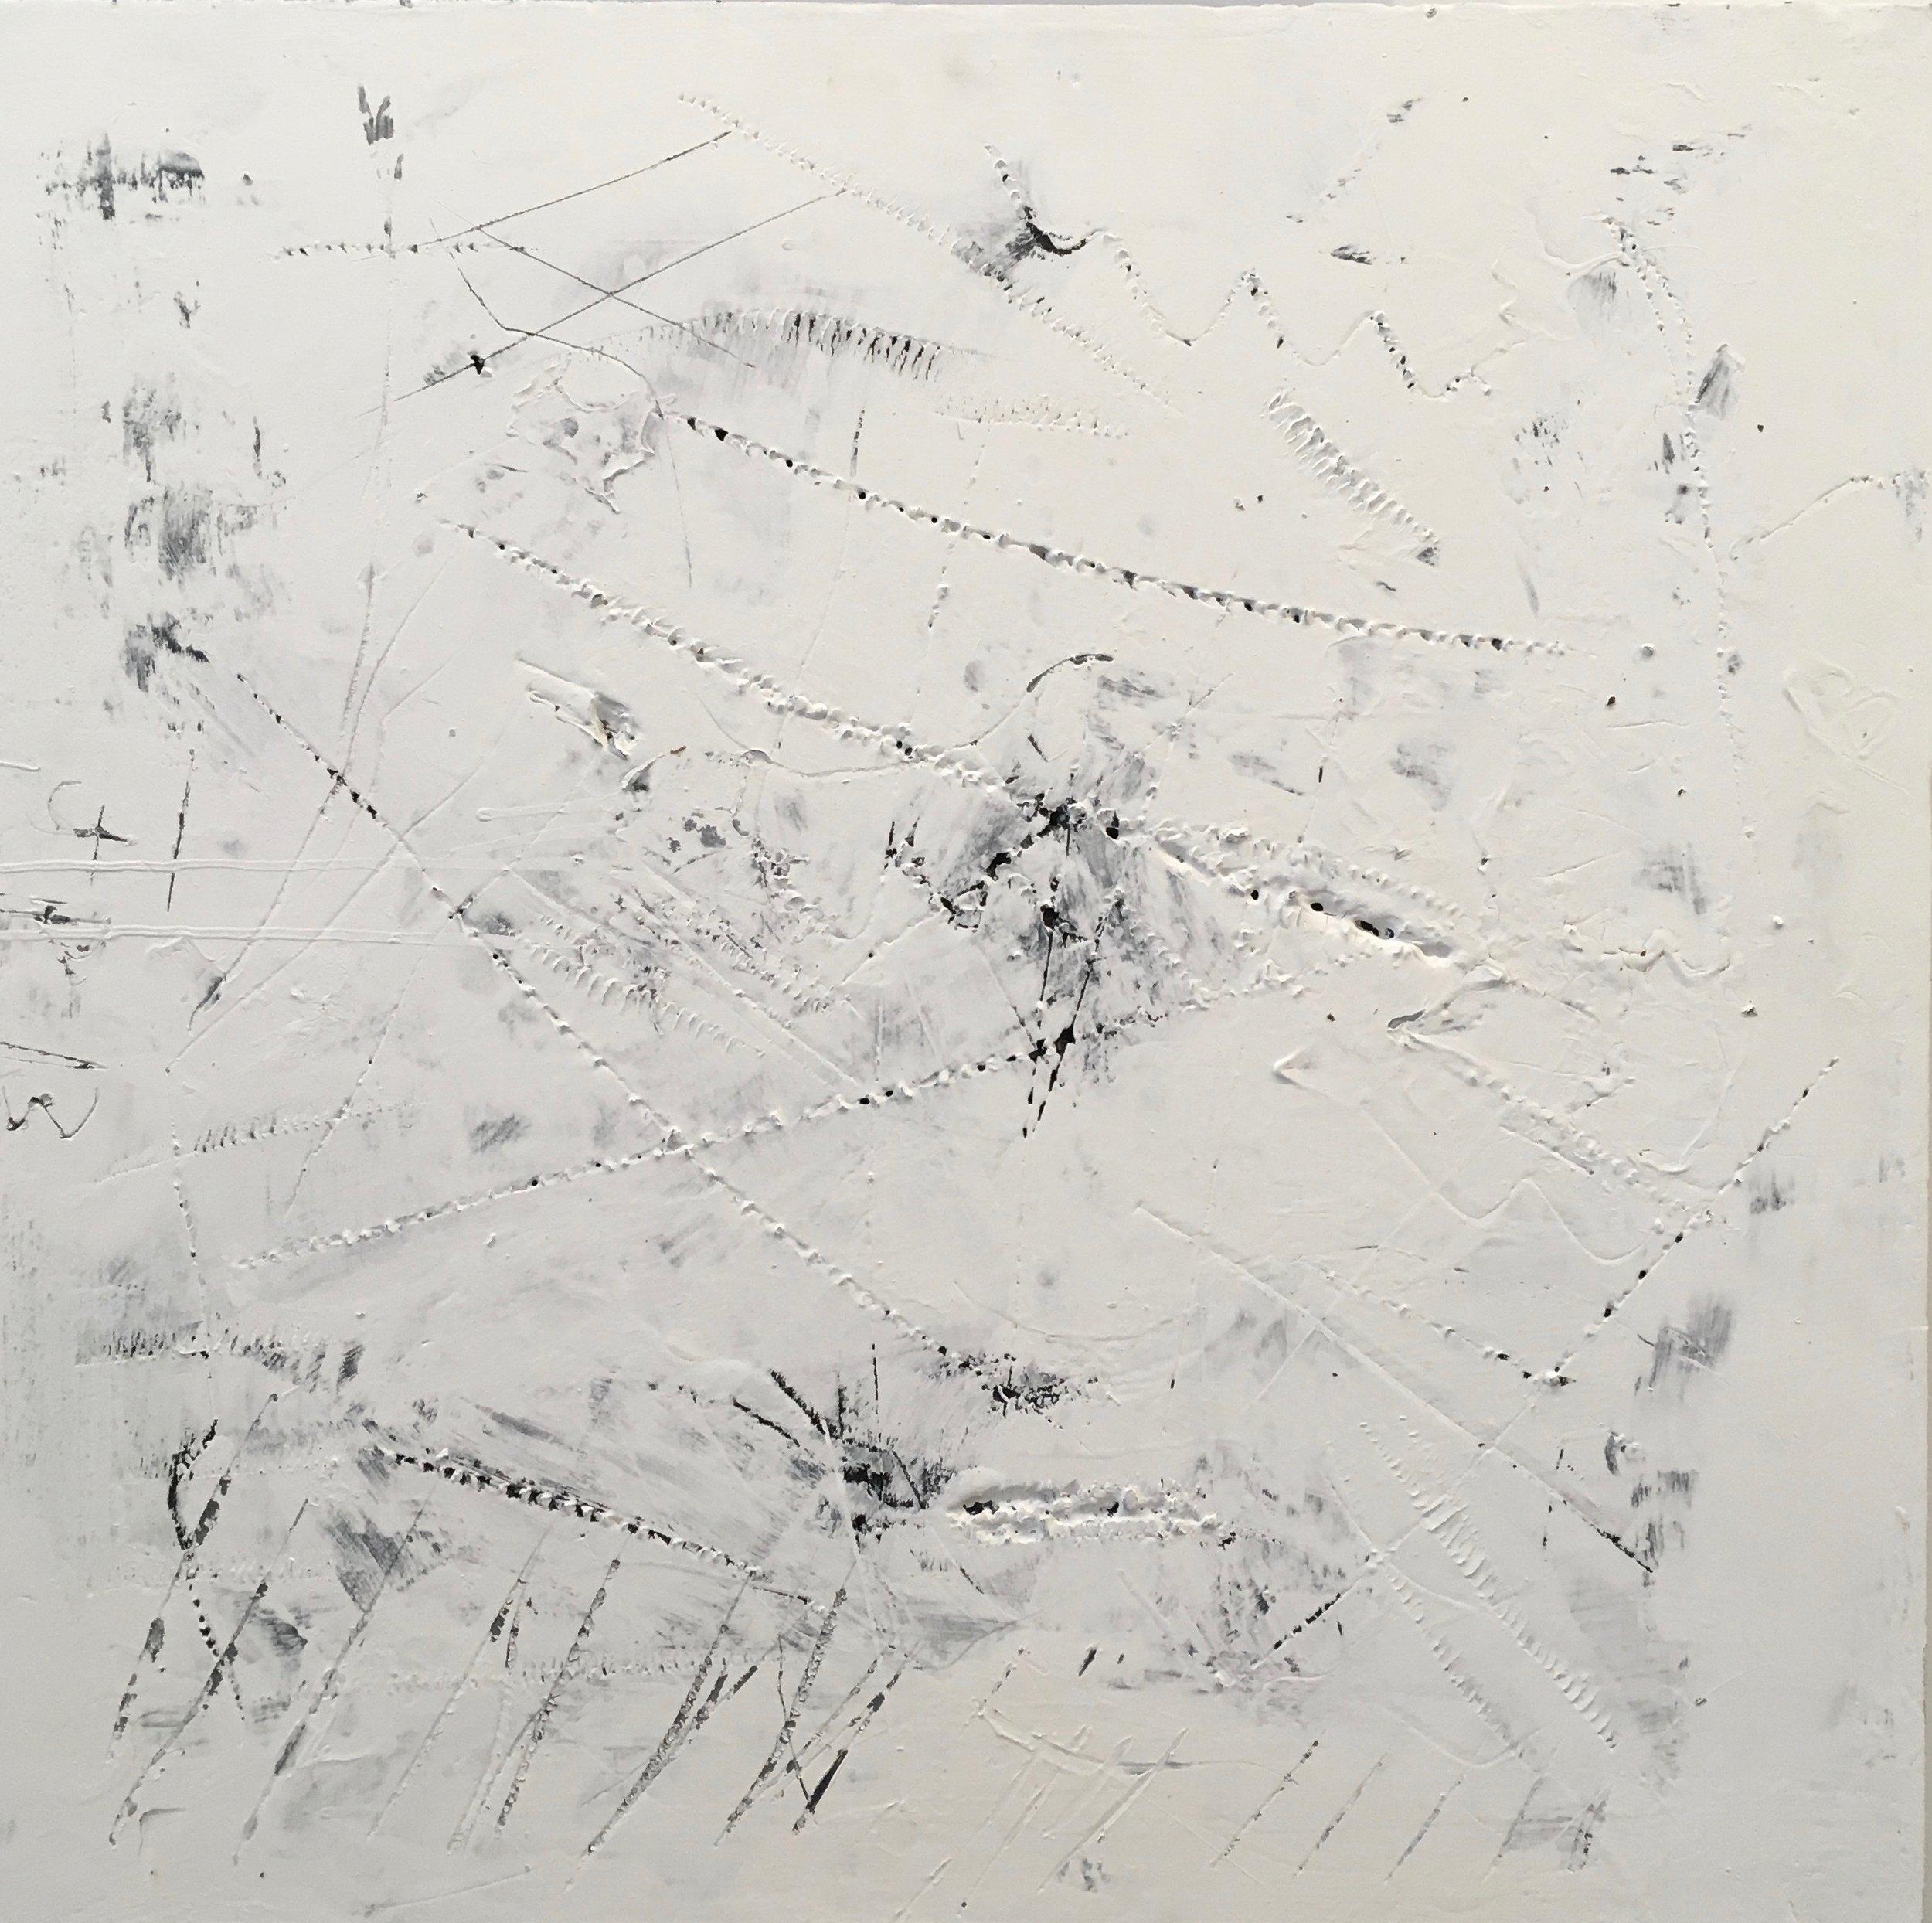 """Scratch Sketch #4,"" 2013. 24 x 24 in., acrylic on insulation board"